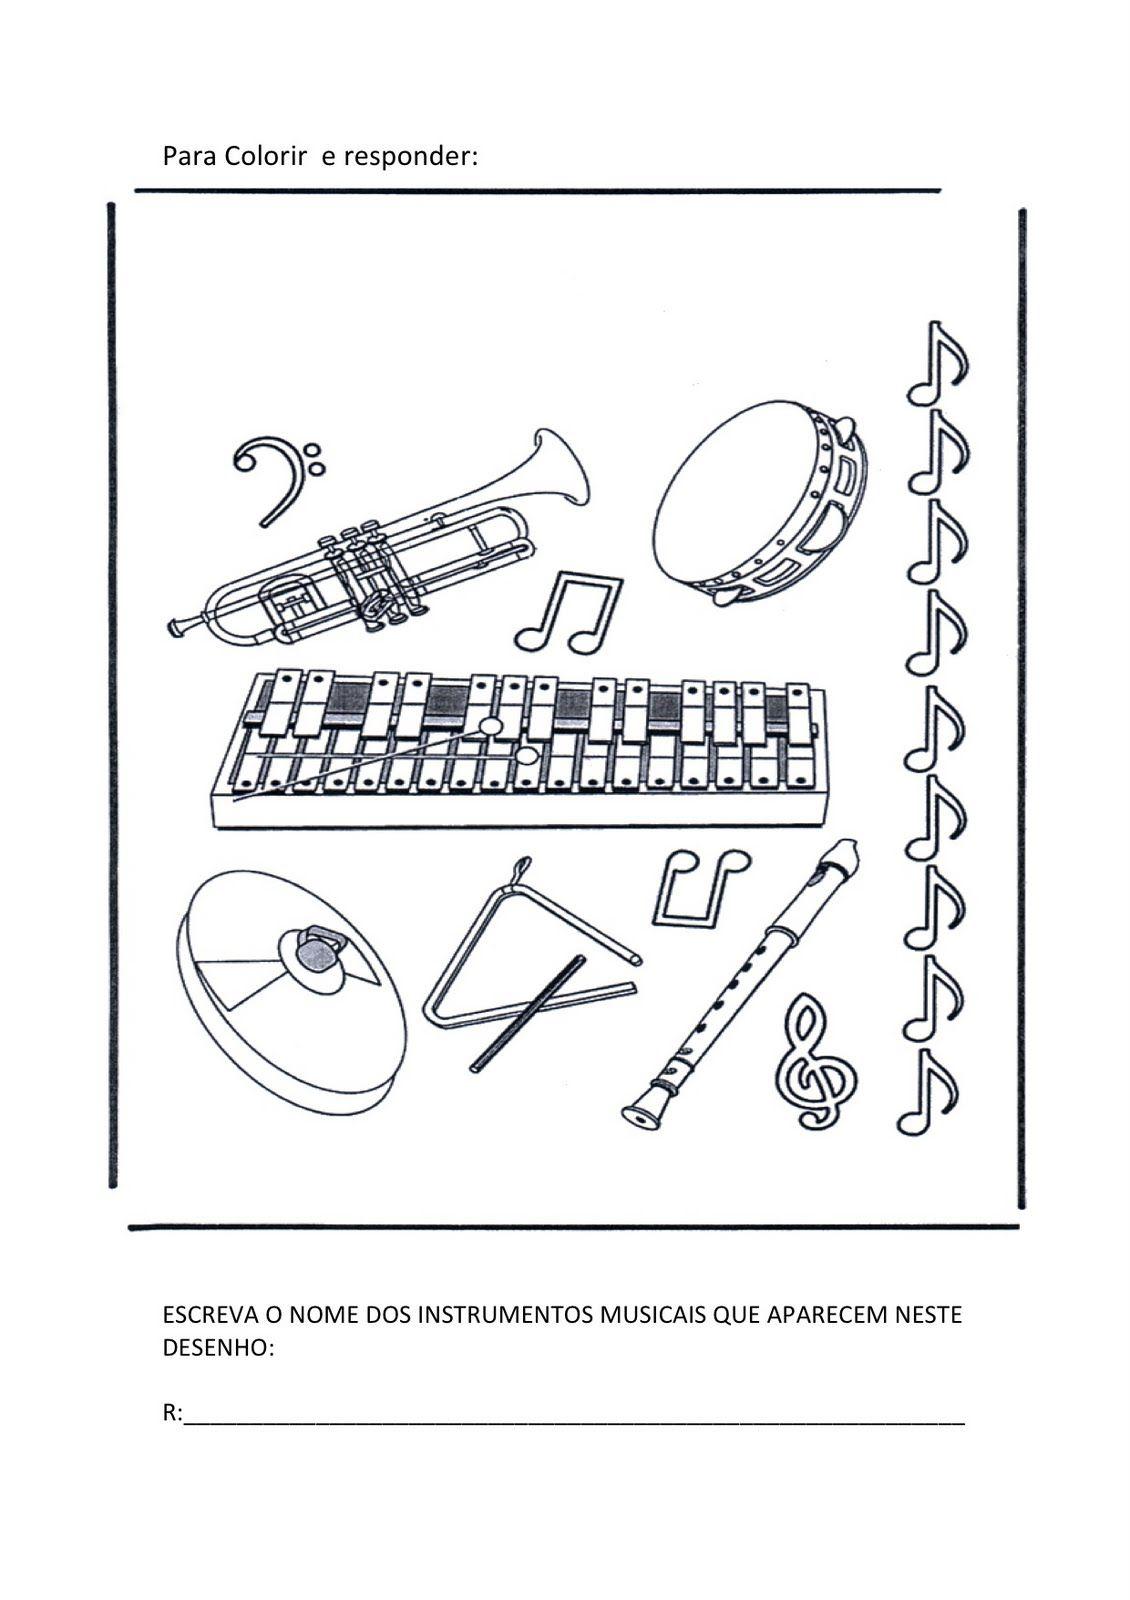 Resultado De Imagem Para Musica Para Colorir Educacao Musical